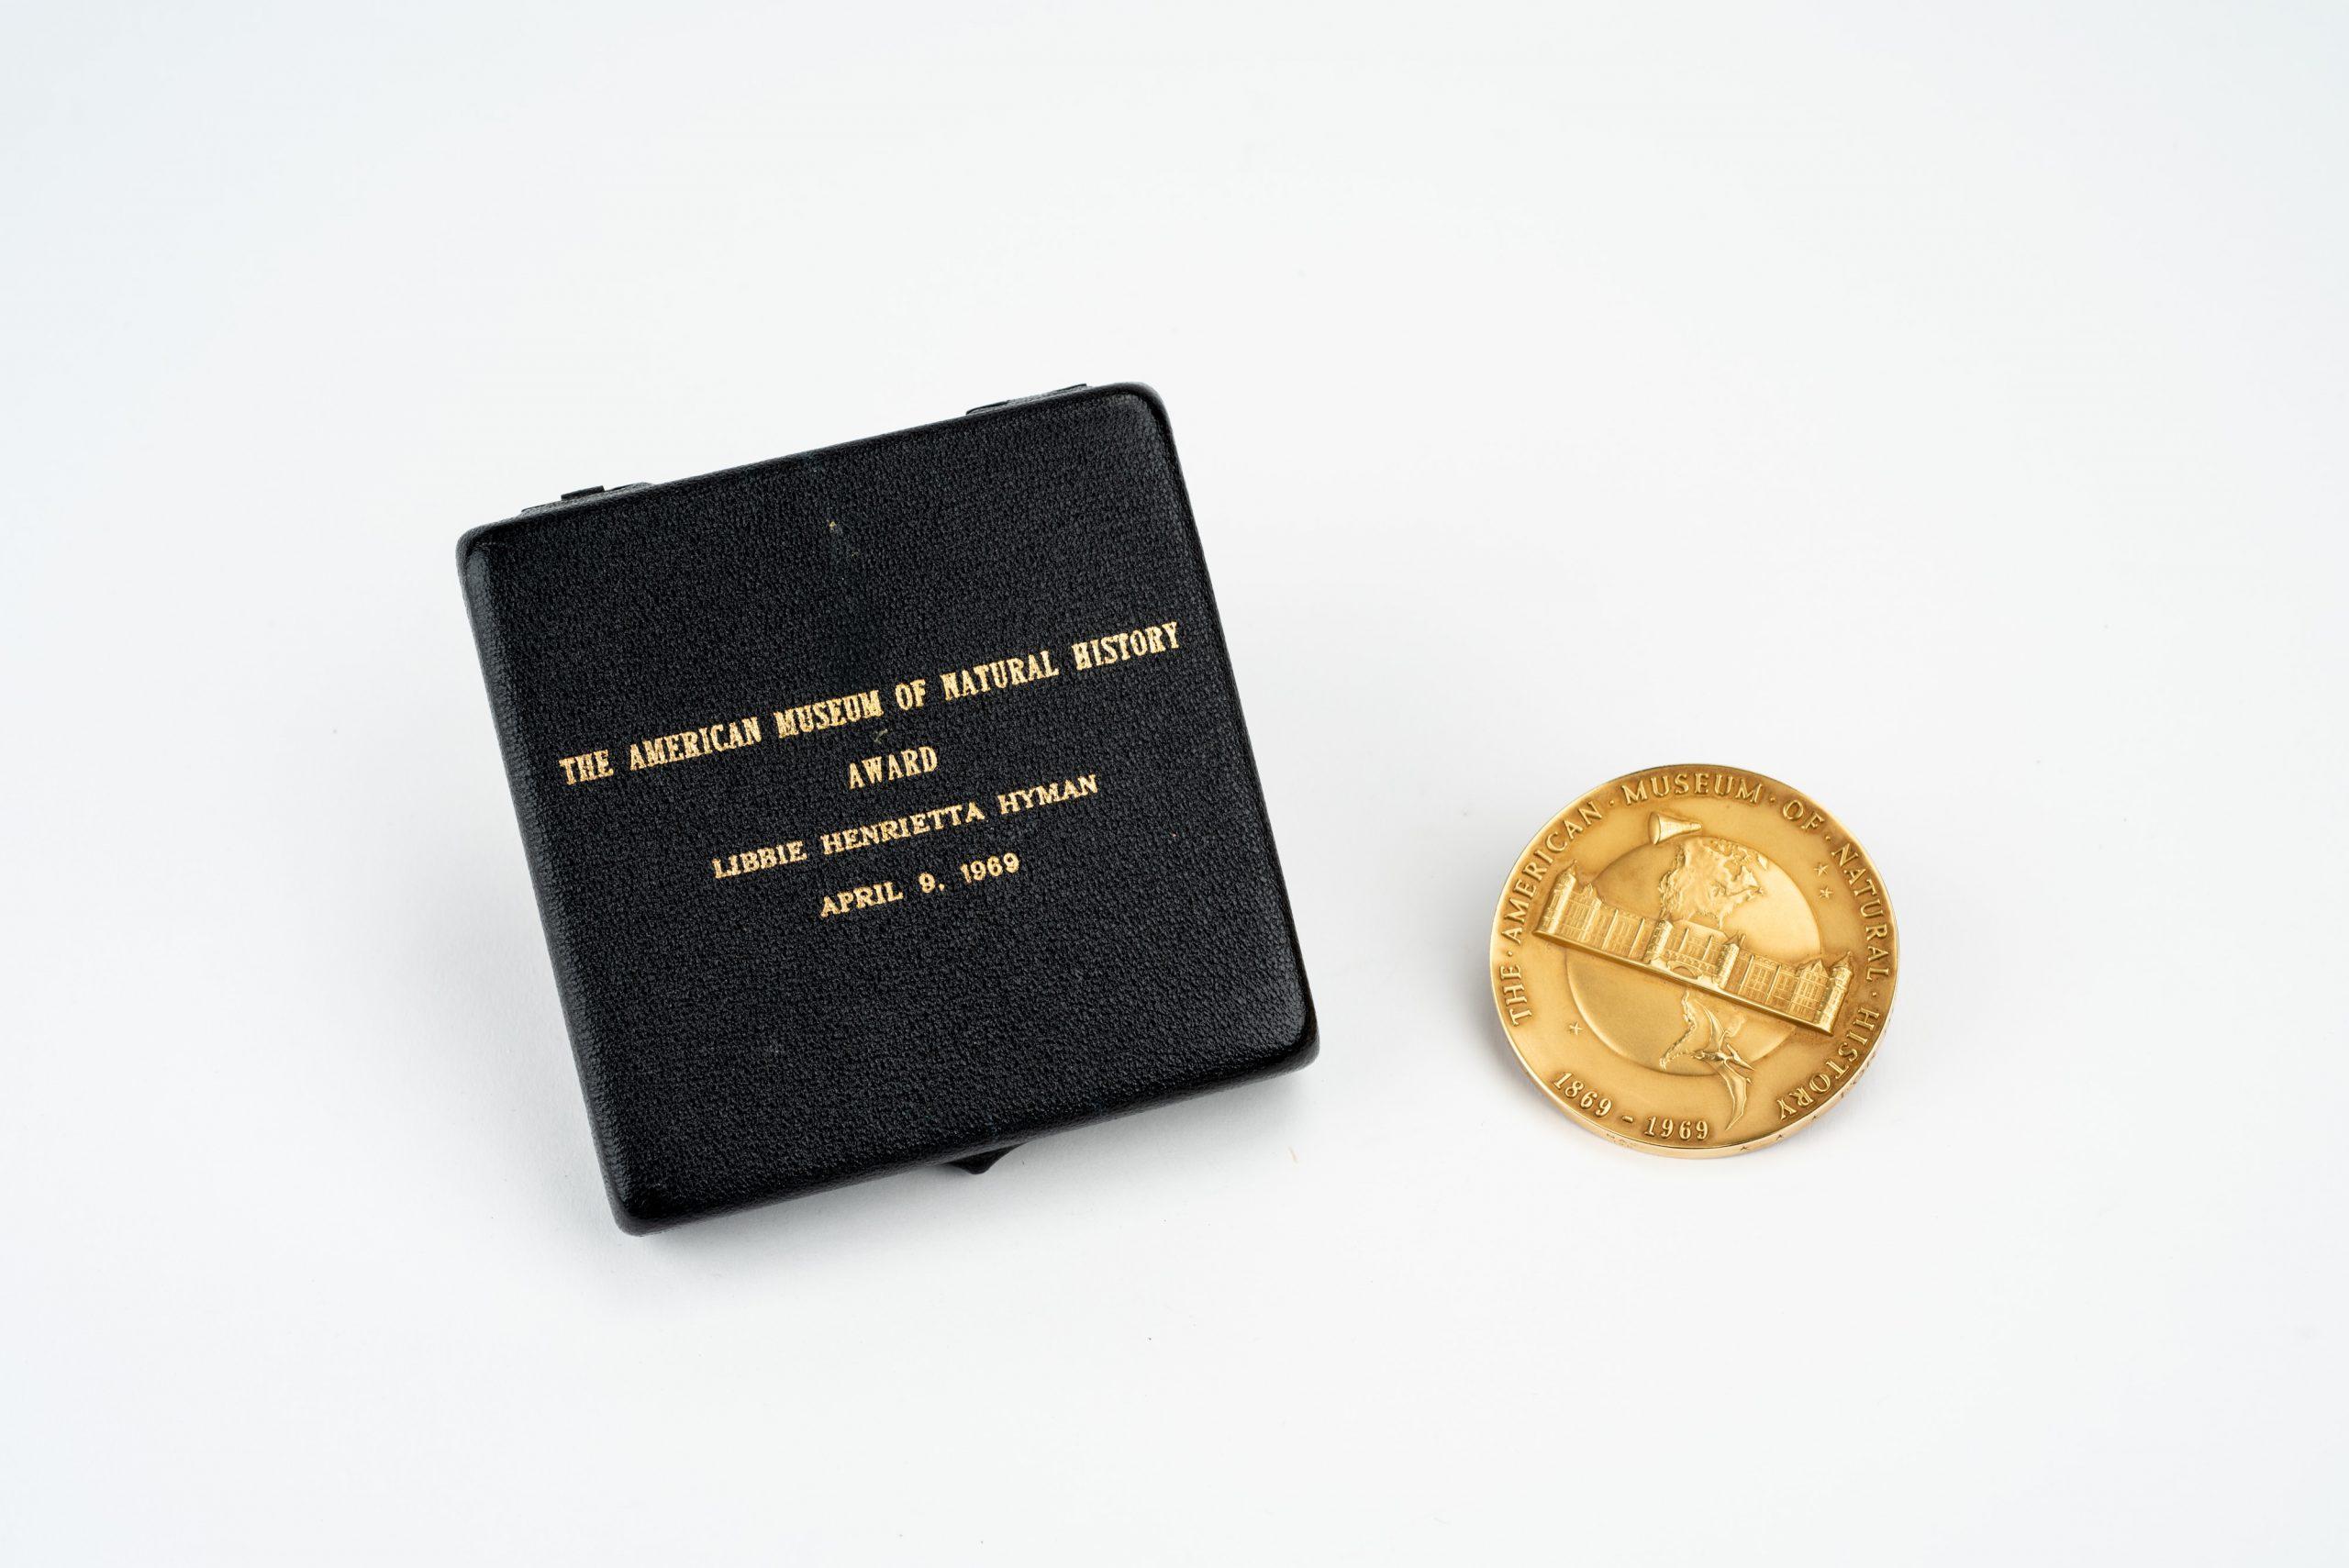 Libbie Hyman Medal